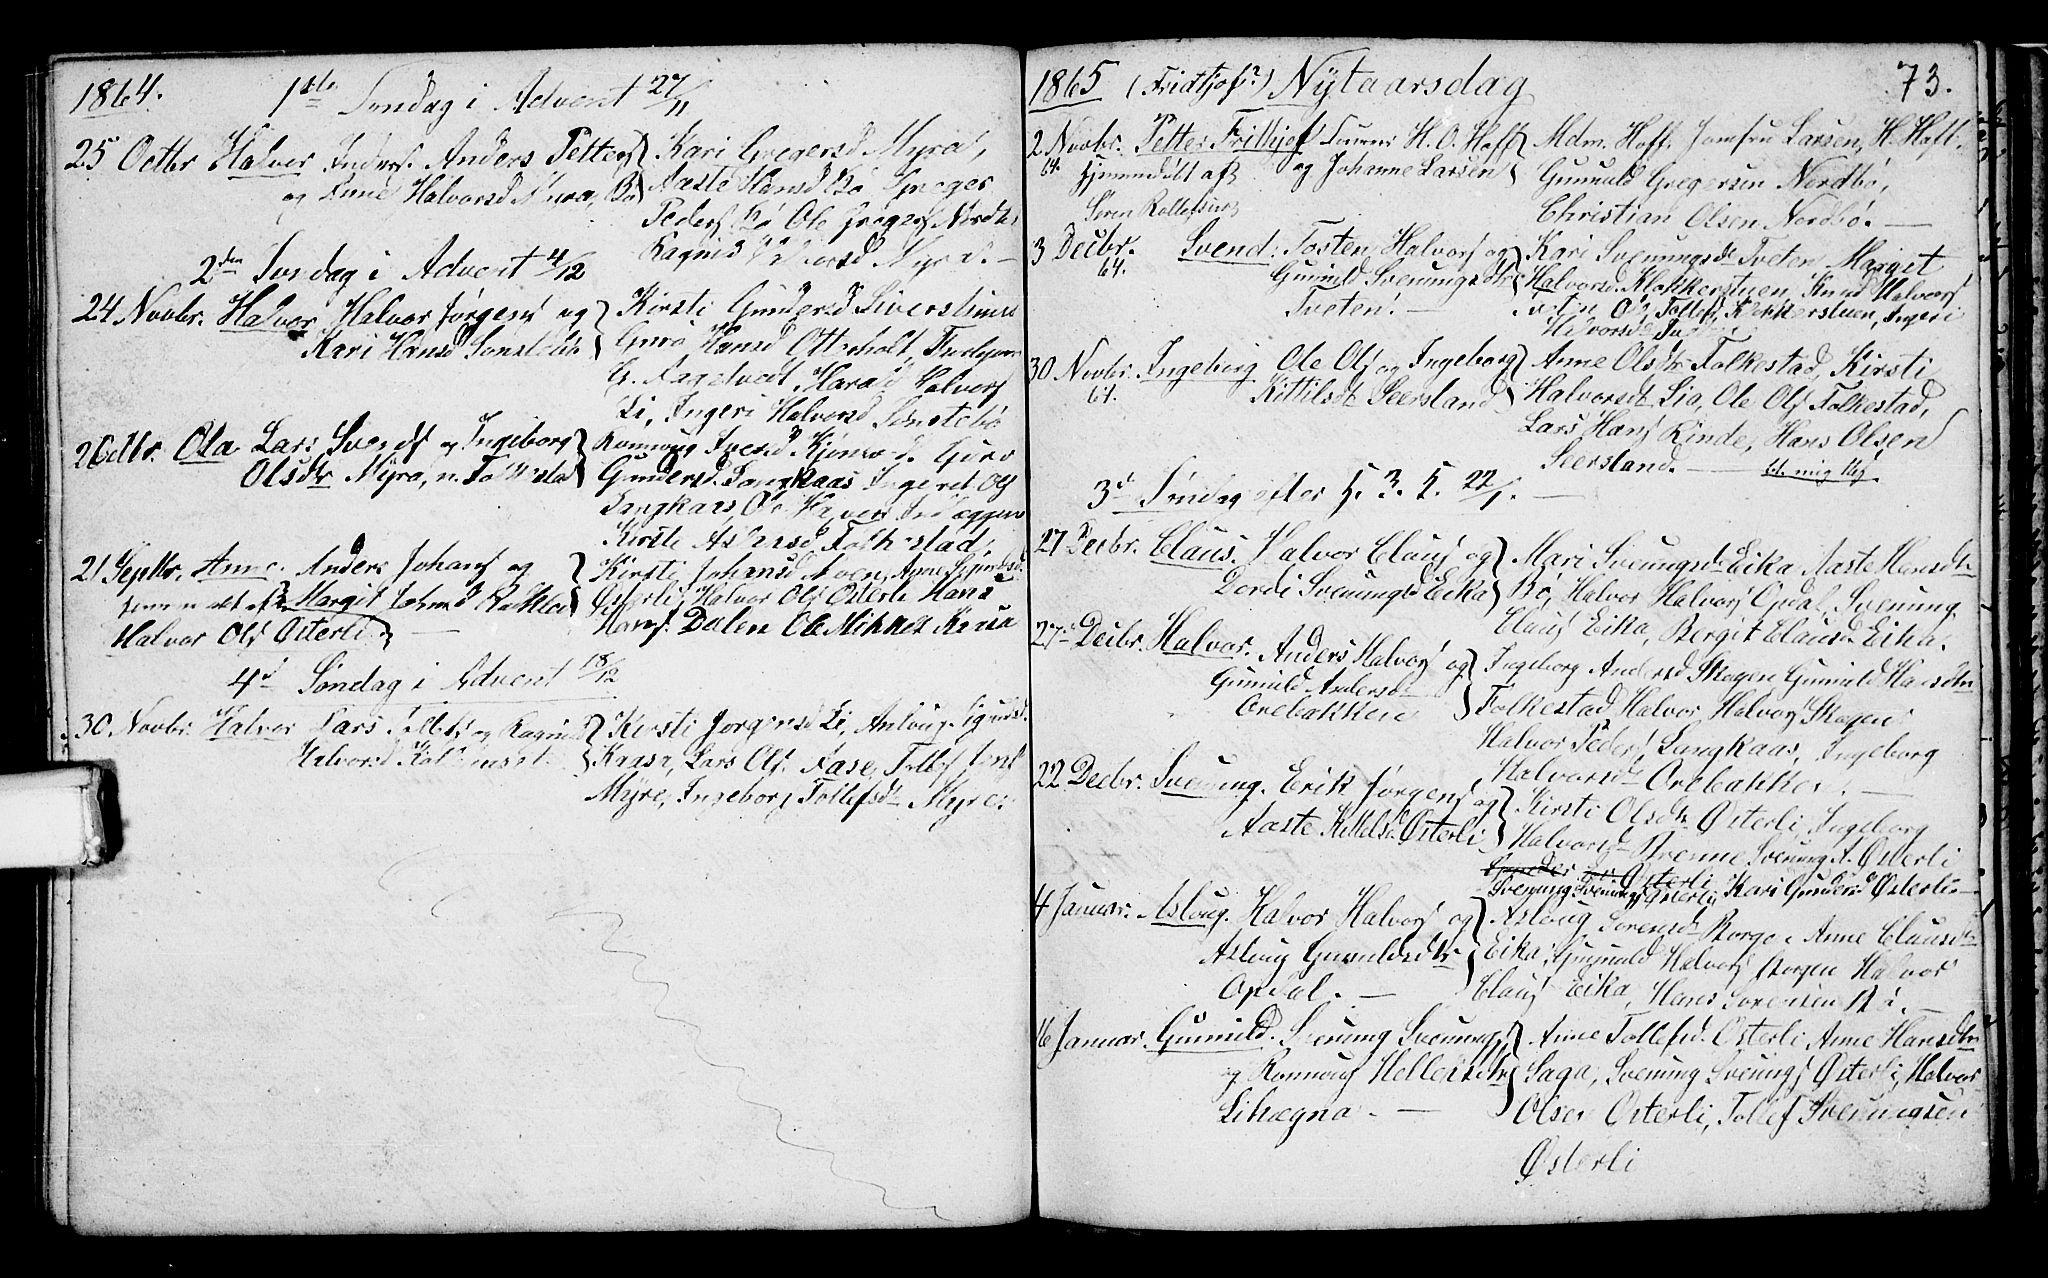 SAKO, Bø kirkebøker, G/Ga/L0002: Klokkerbok nr. 2, 1853-1866, s. 73